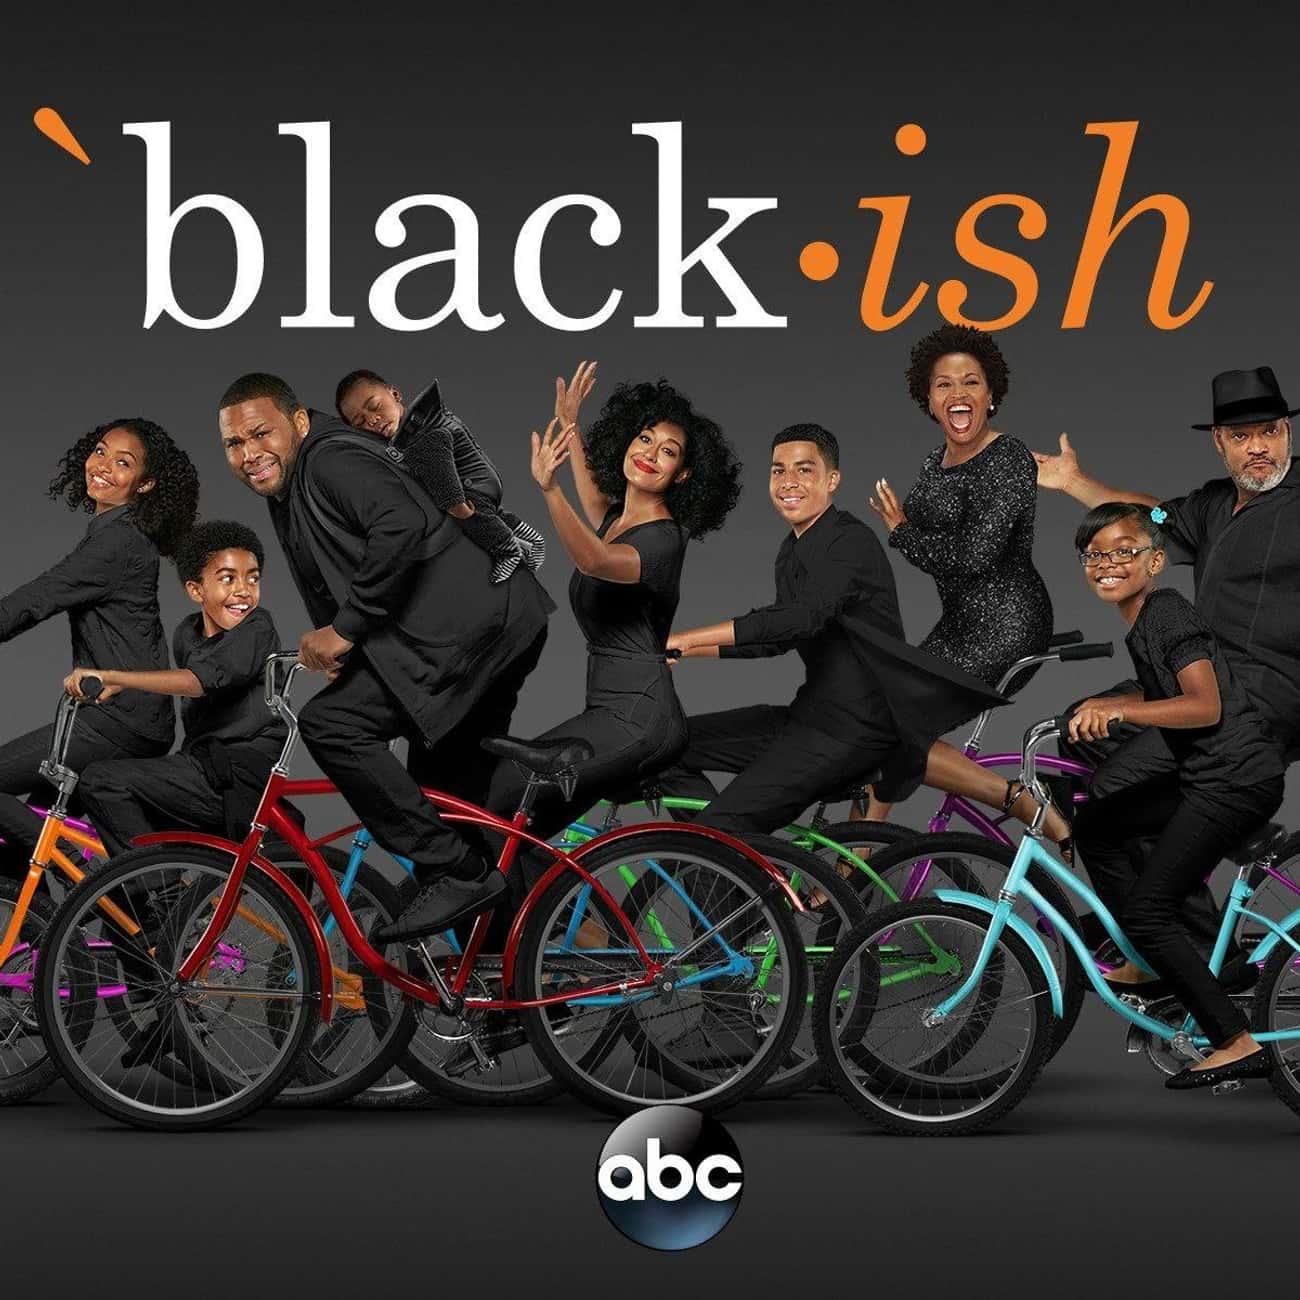 Blackish - Season 4 is listed (or ranked) 4 on the list Ranking the Best Seasons of 'Black-ish'